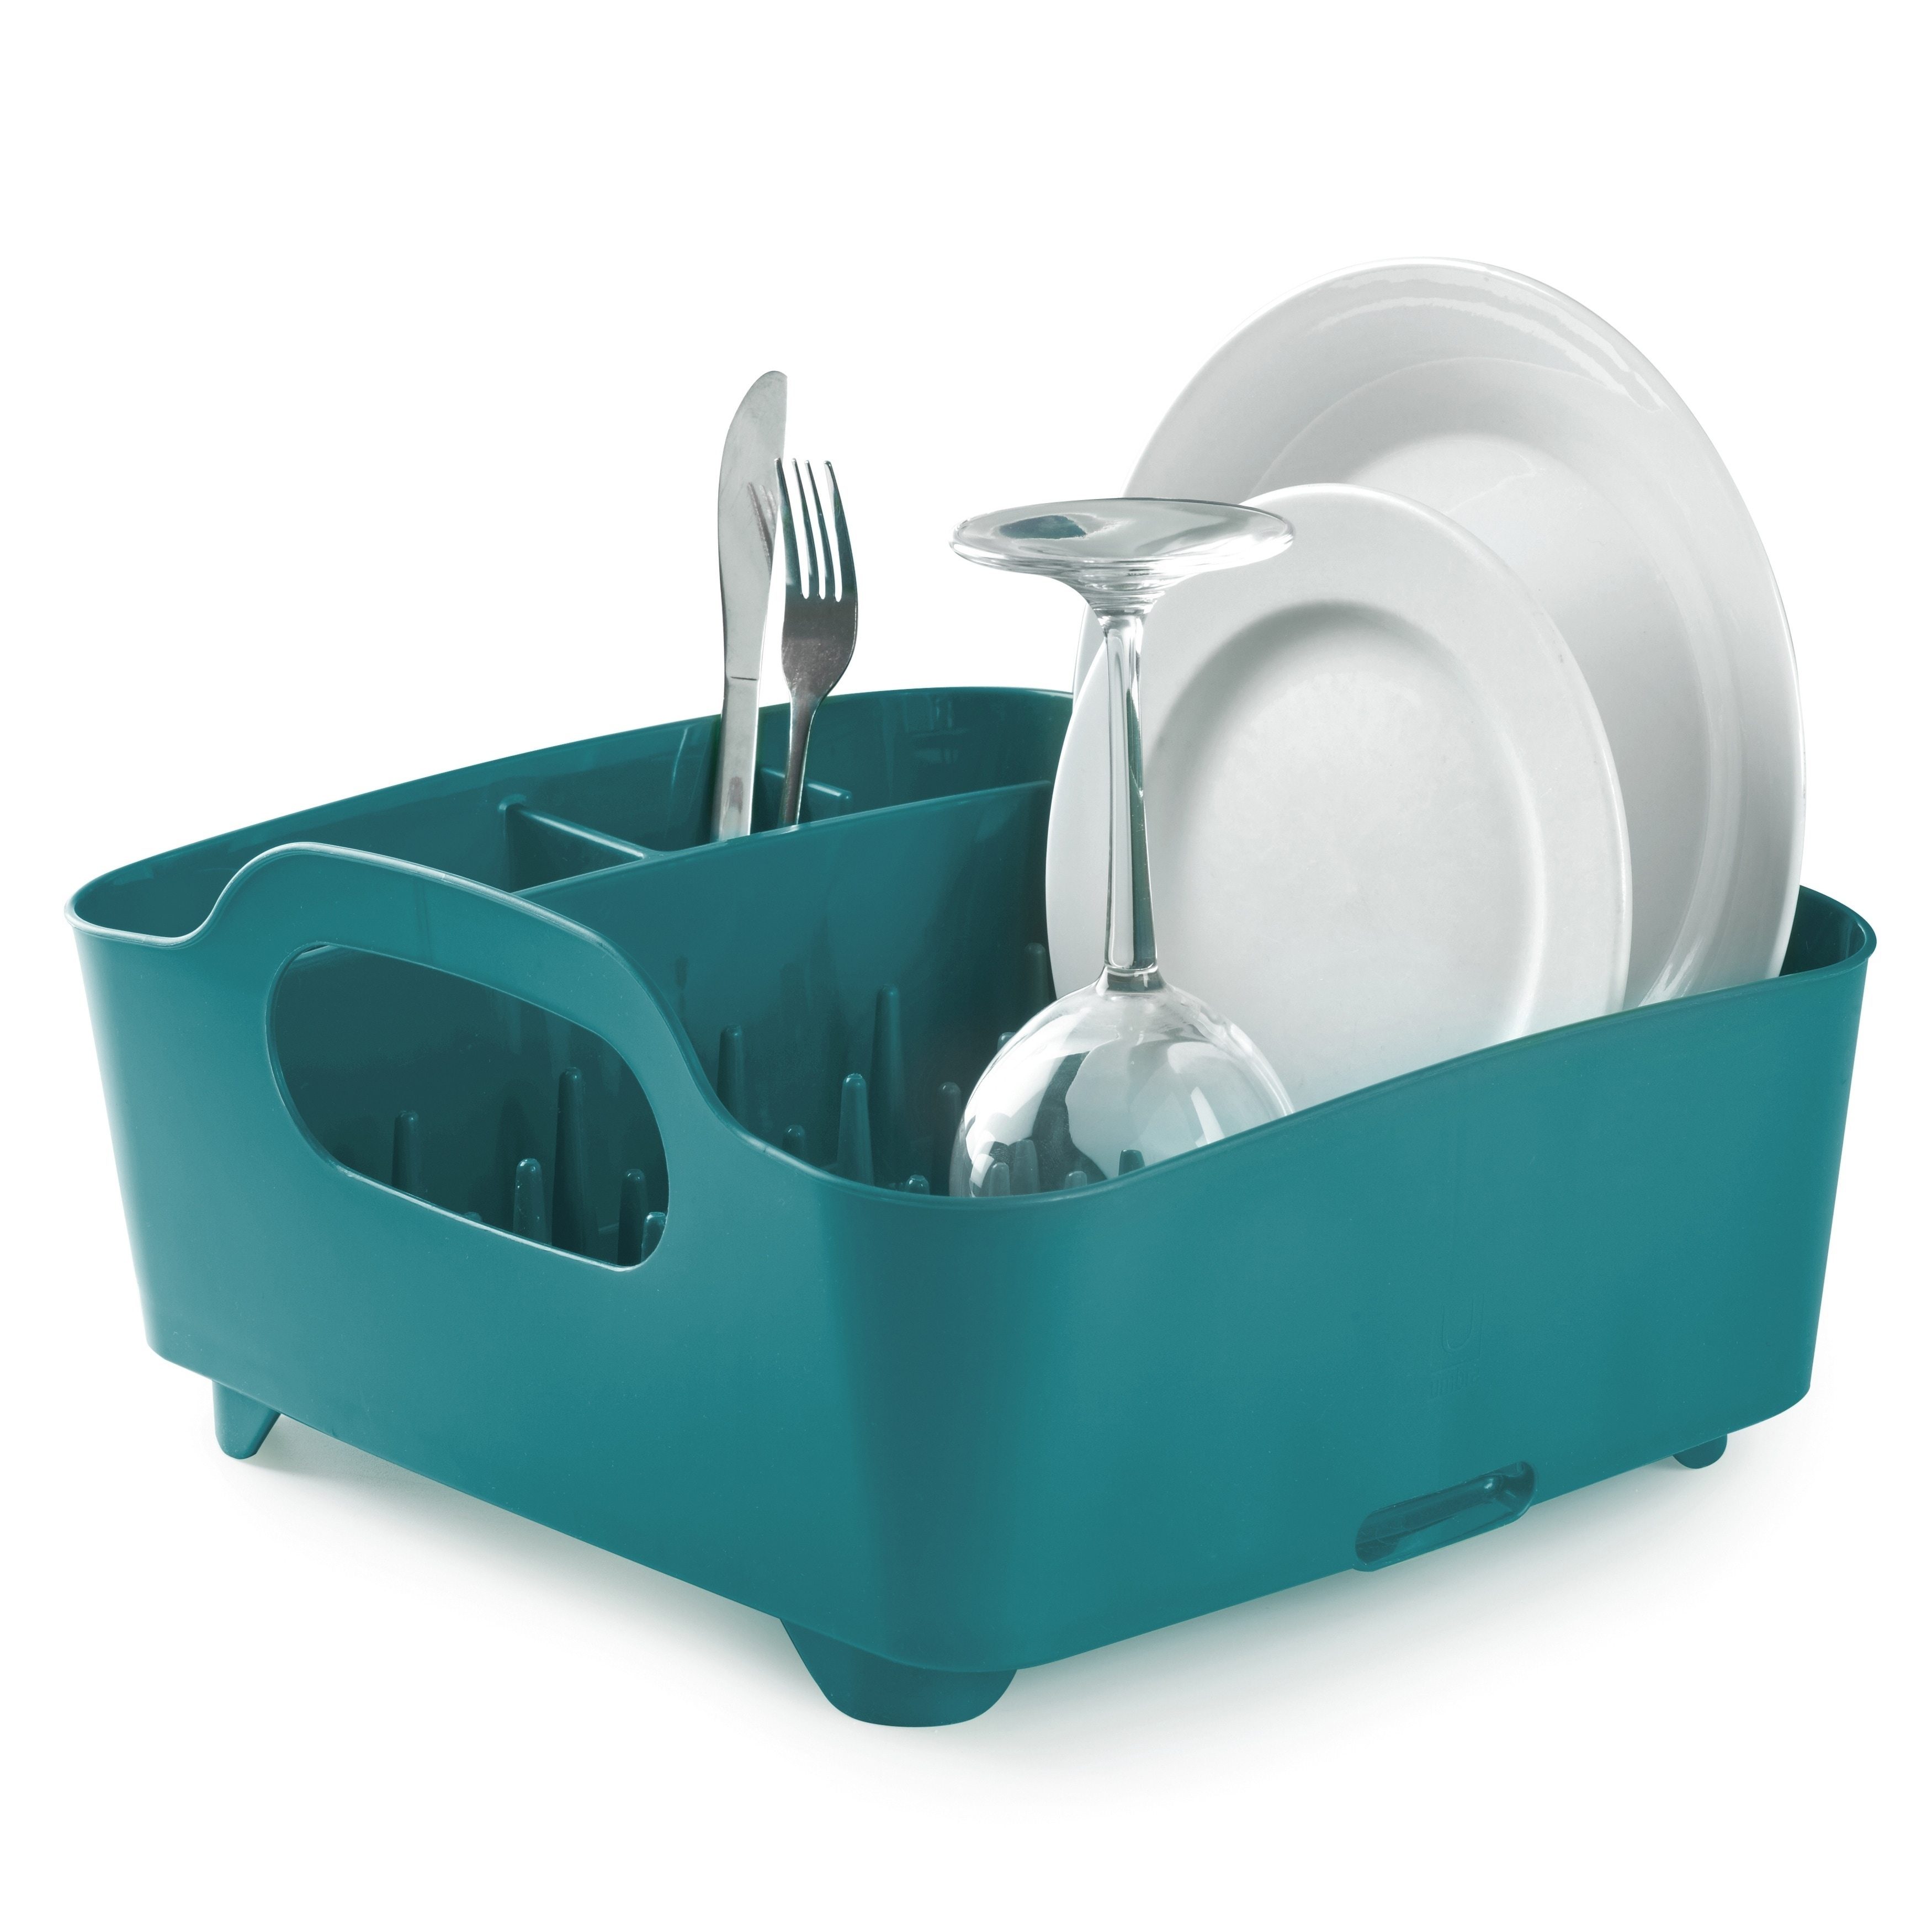 Umbra Tub All in e Self Draining Dish Drying Rack Free Shipping